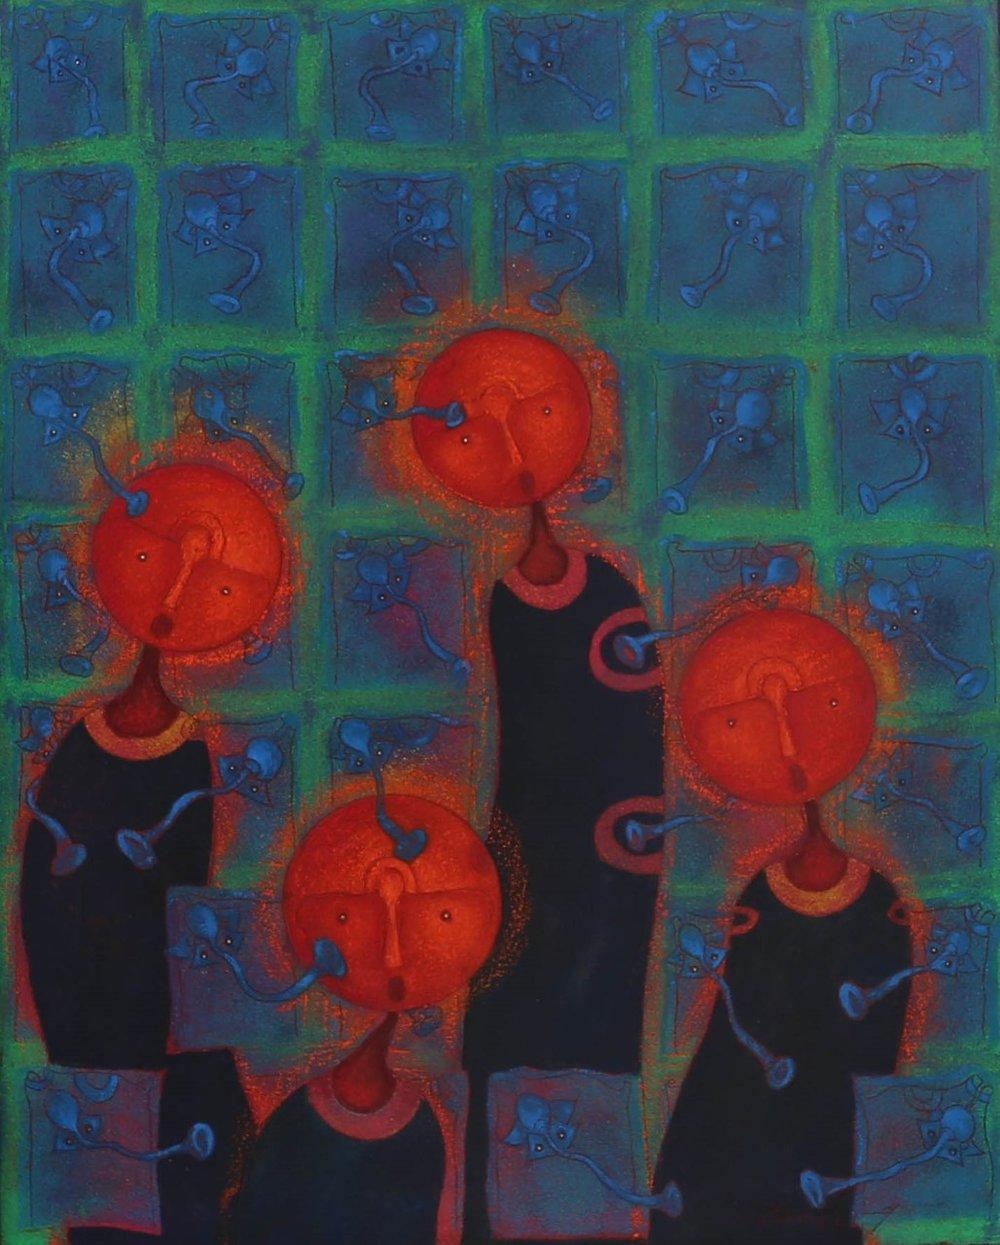 Rolando Rojas.  Encanto , 2018, Marble Dust and Oil on Canvas, 39.5 x 31.5 i